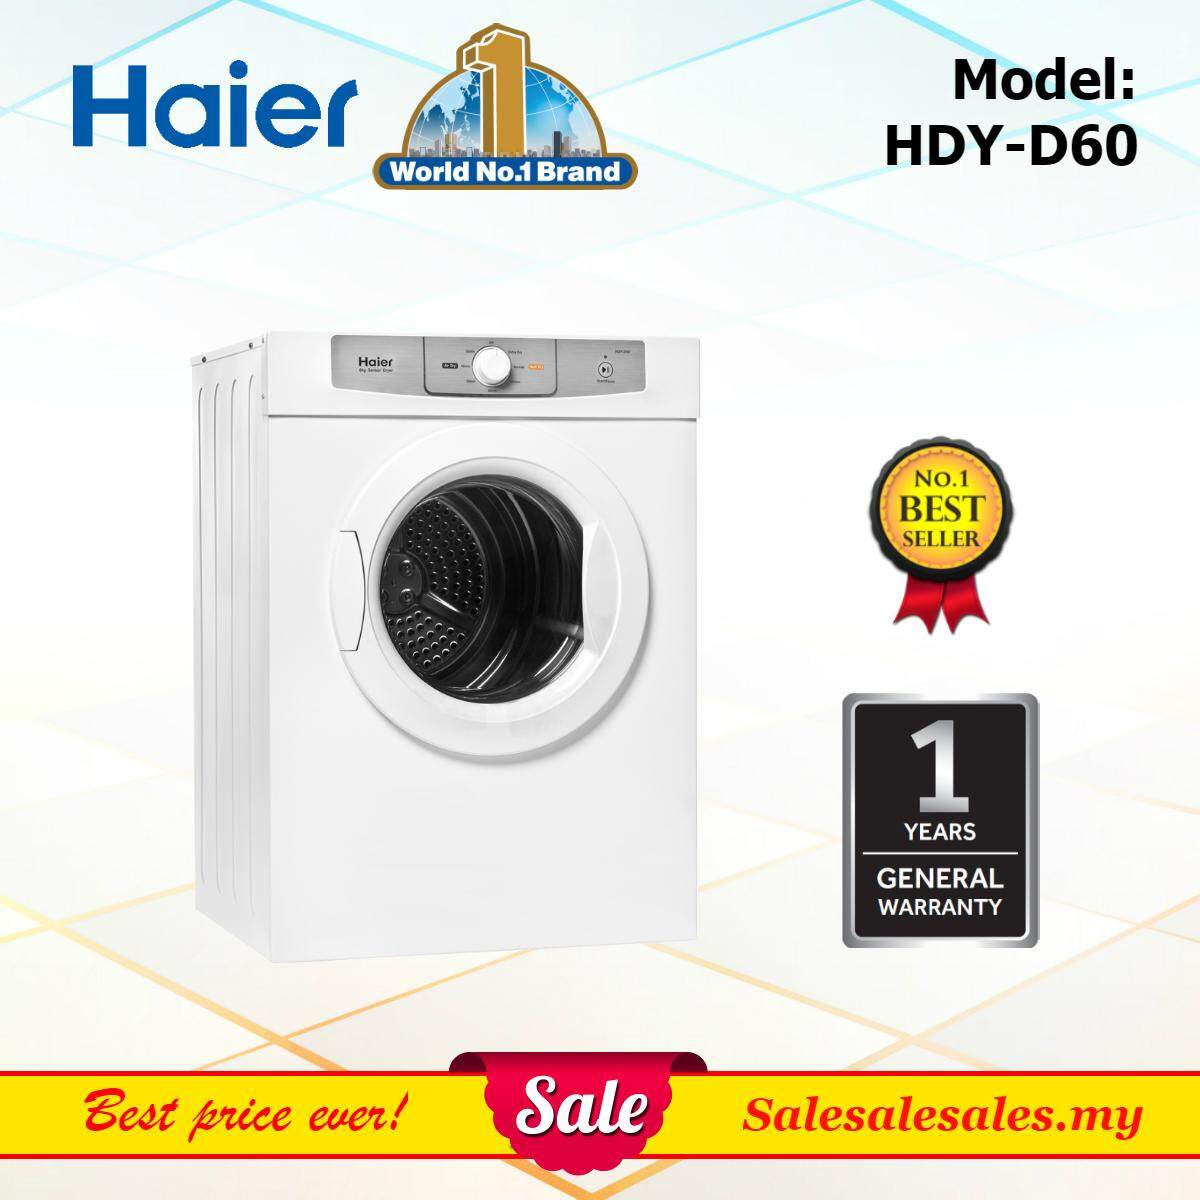 Haier HDY-D60 Tumble Dryer 6kg Cloth Dryer Pengering Kain